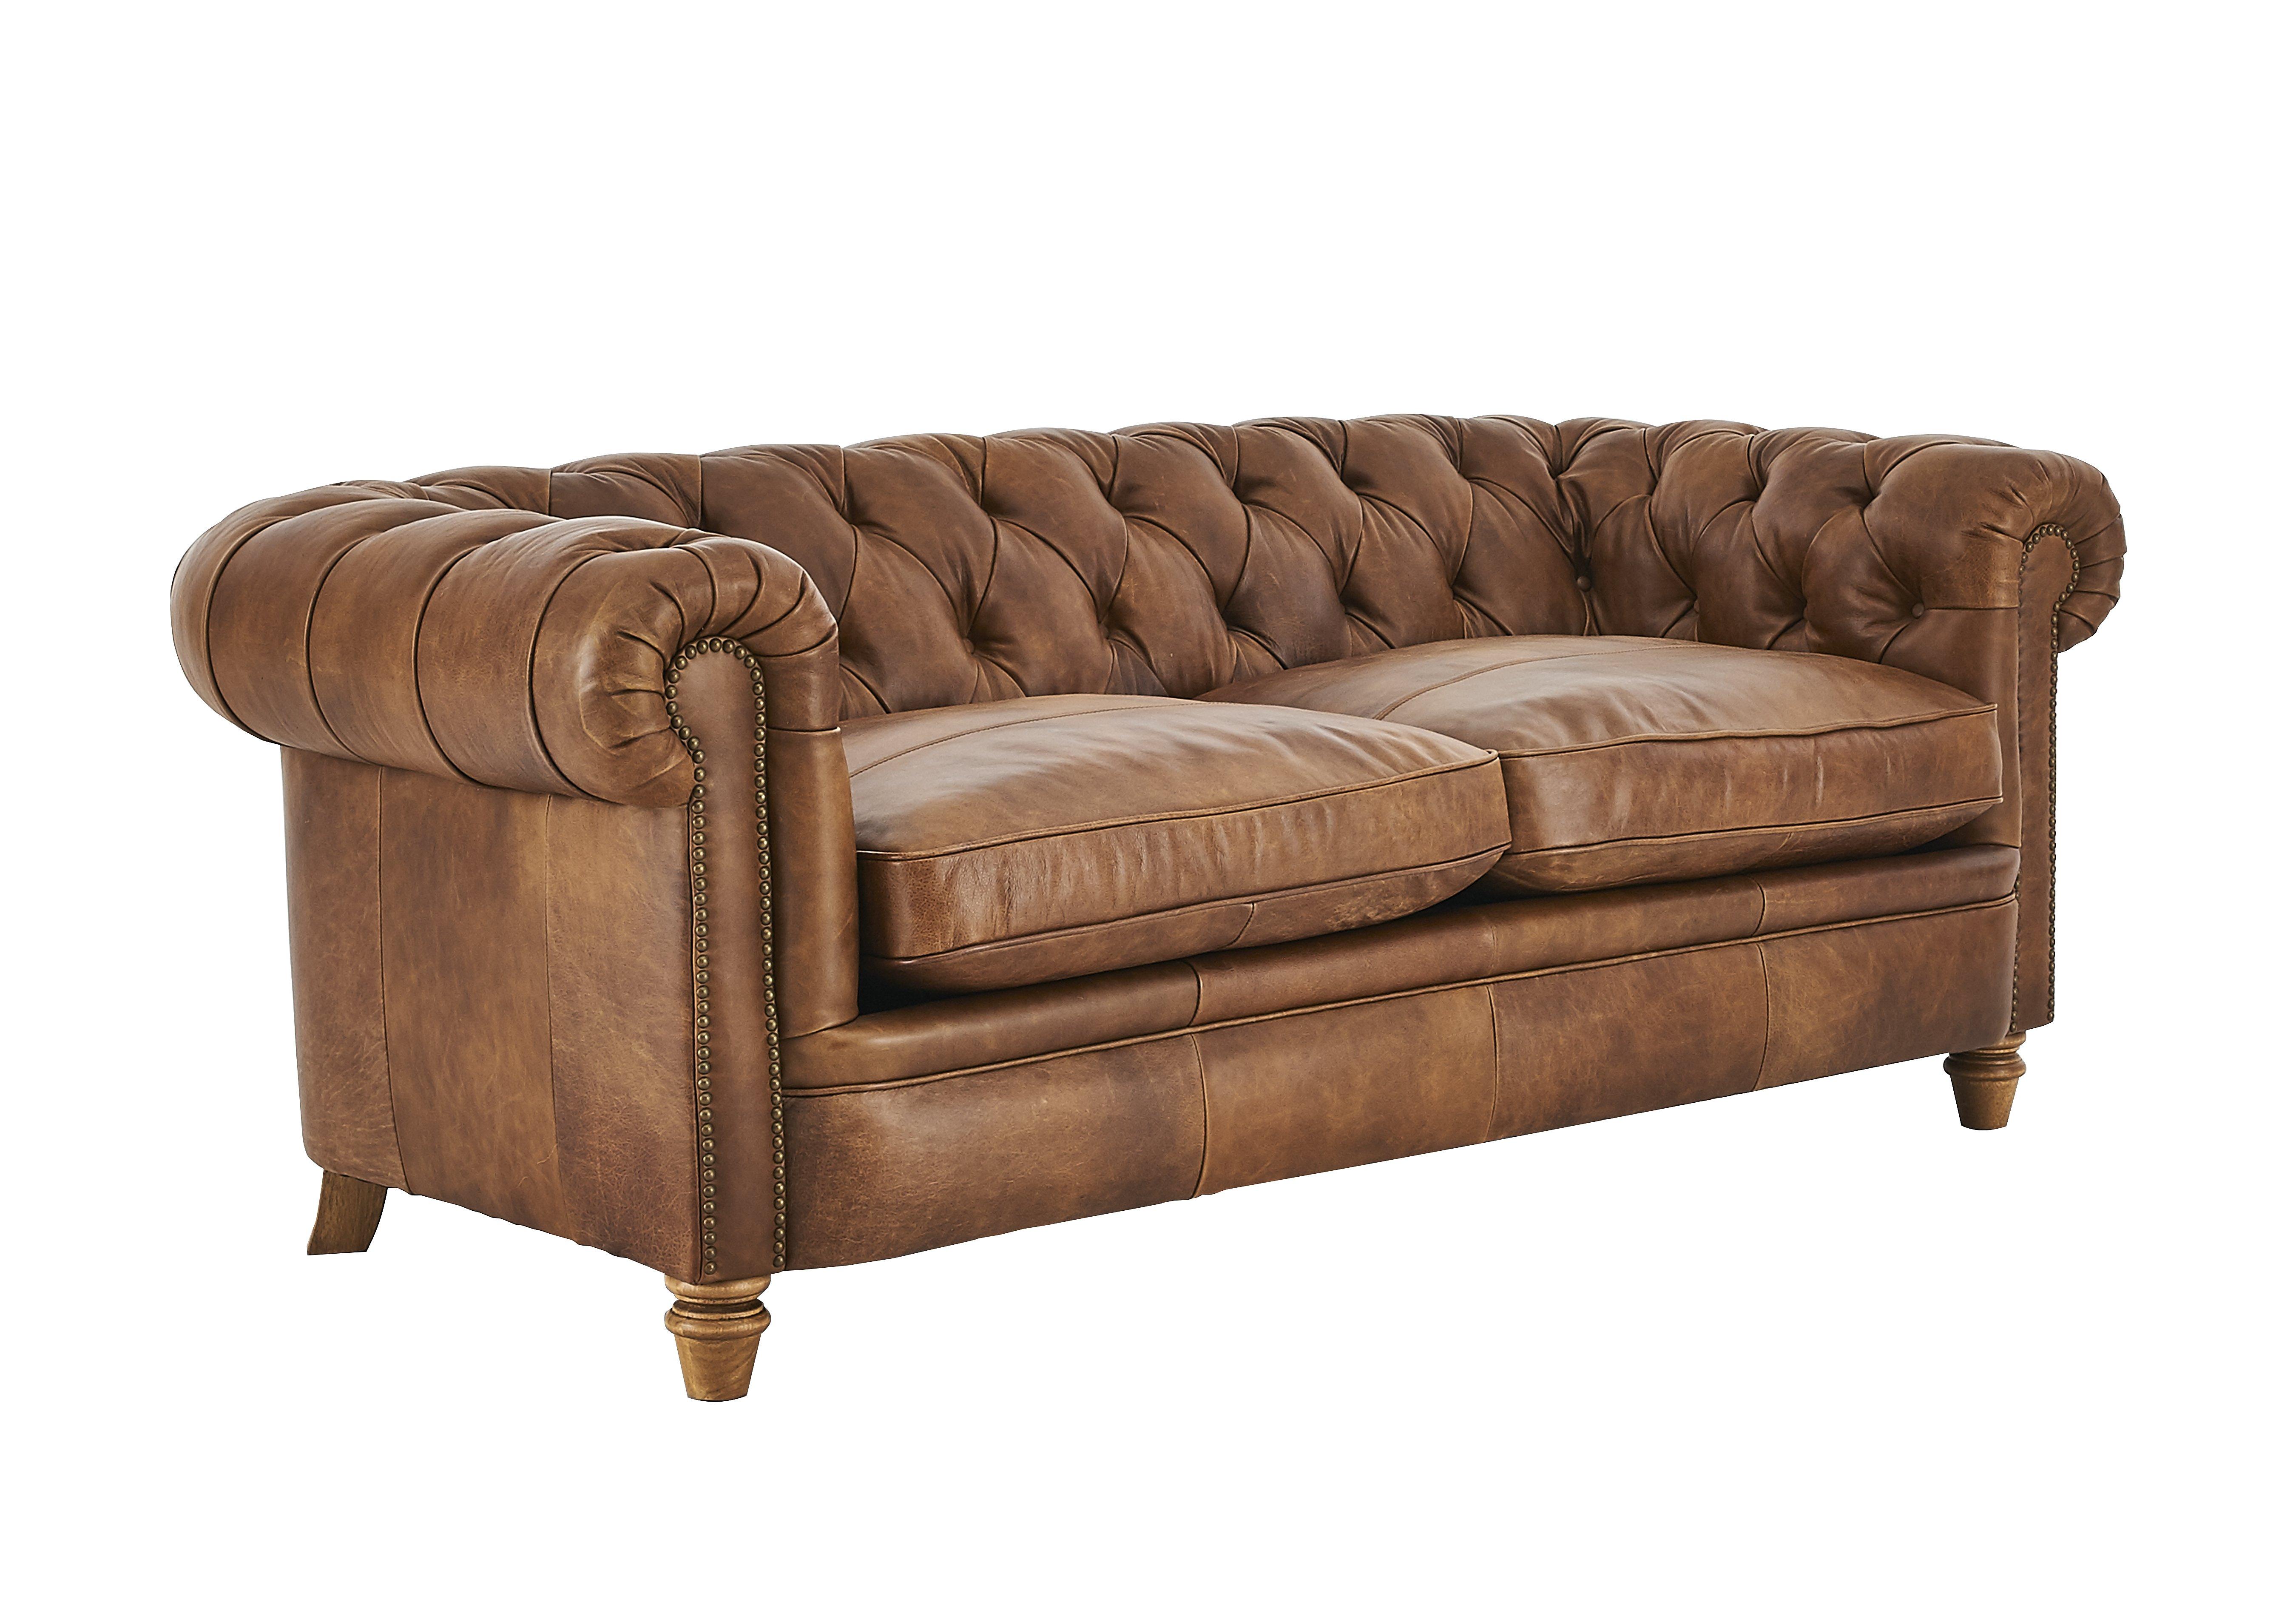 New England Newport 3 Seater Leather Sofa Furniture Village